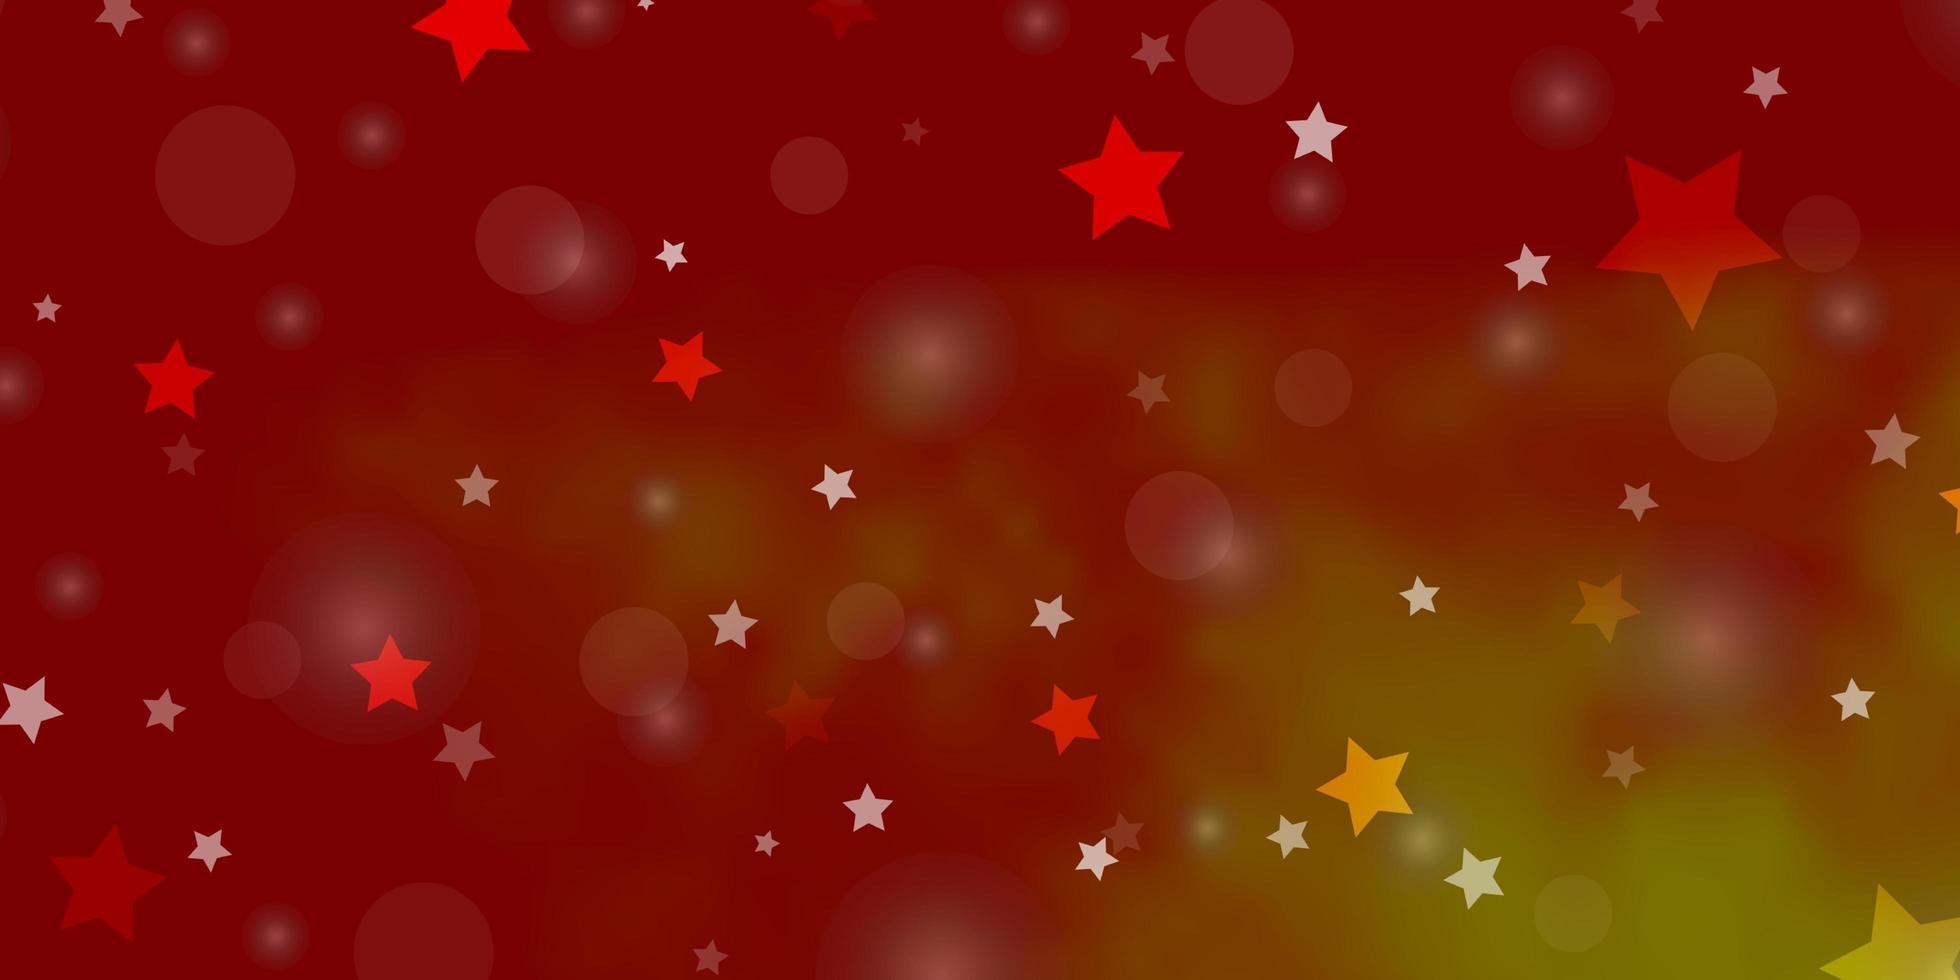 fundo vector vermelho, amarelo claro com círculos, estrelas.